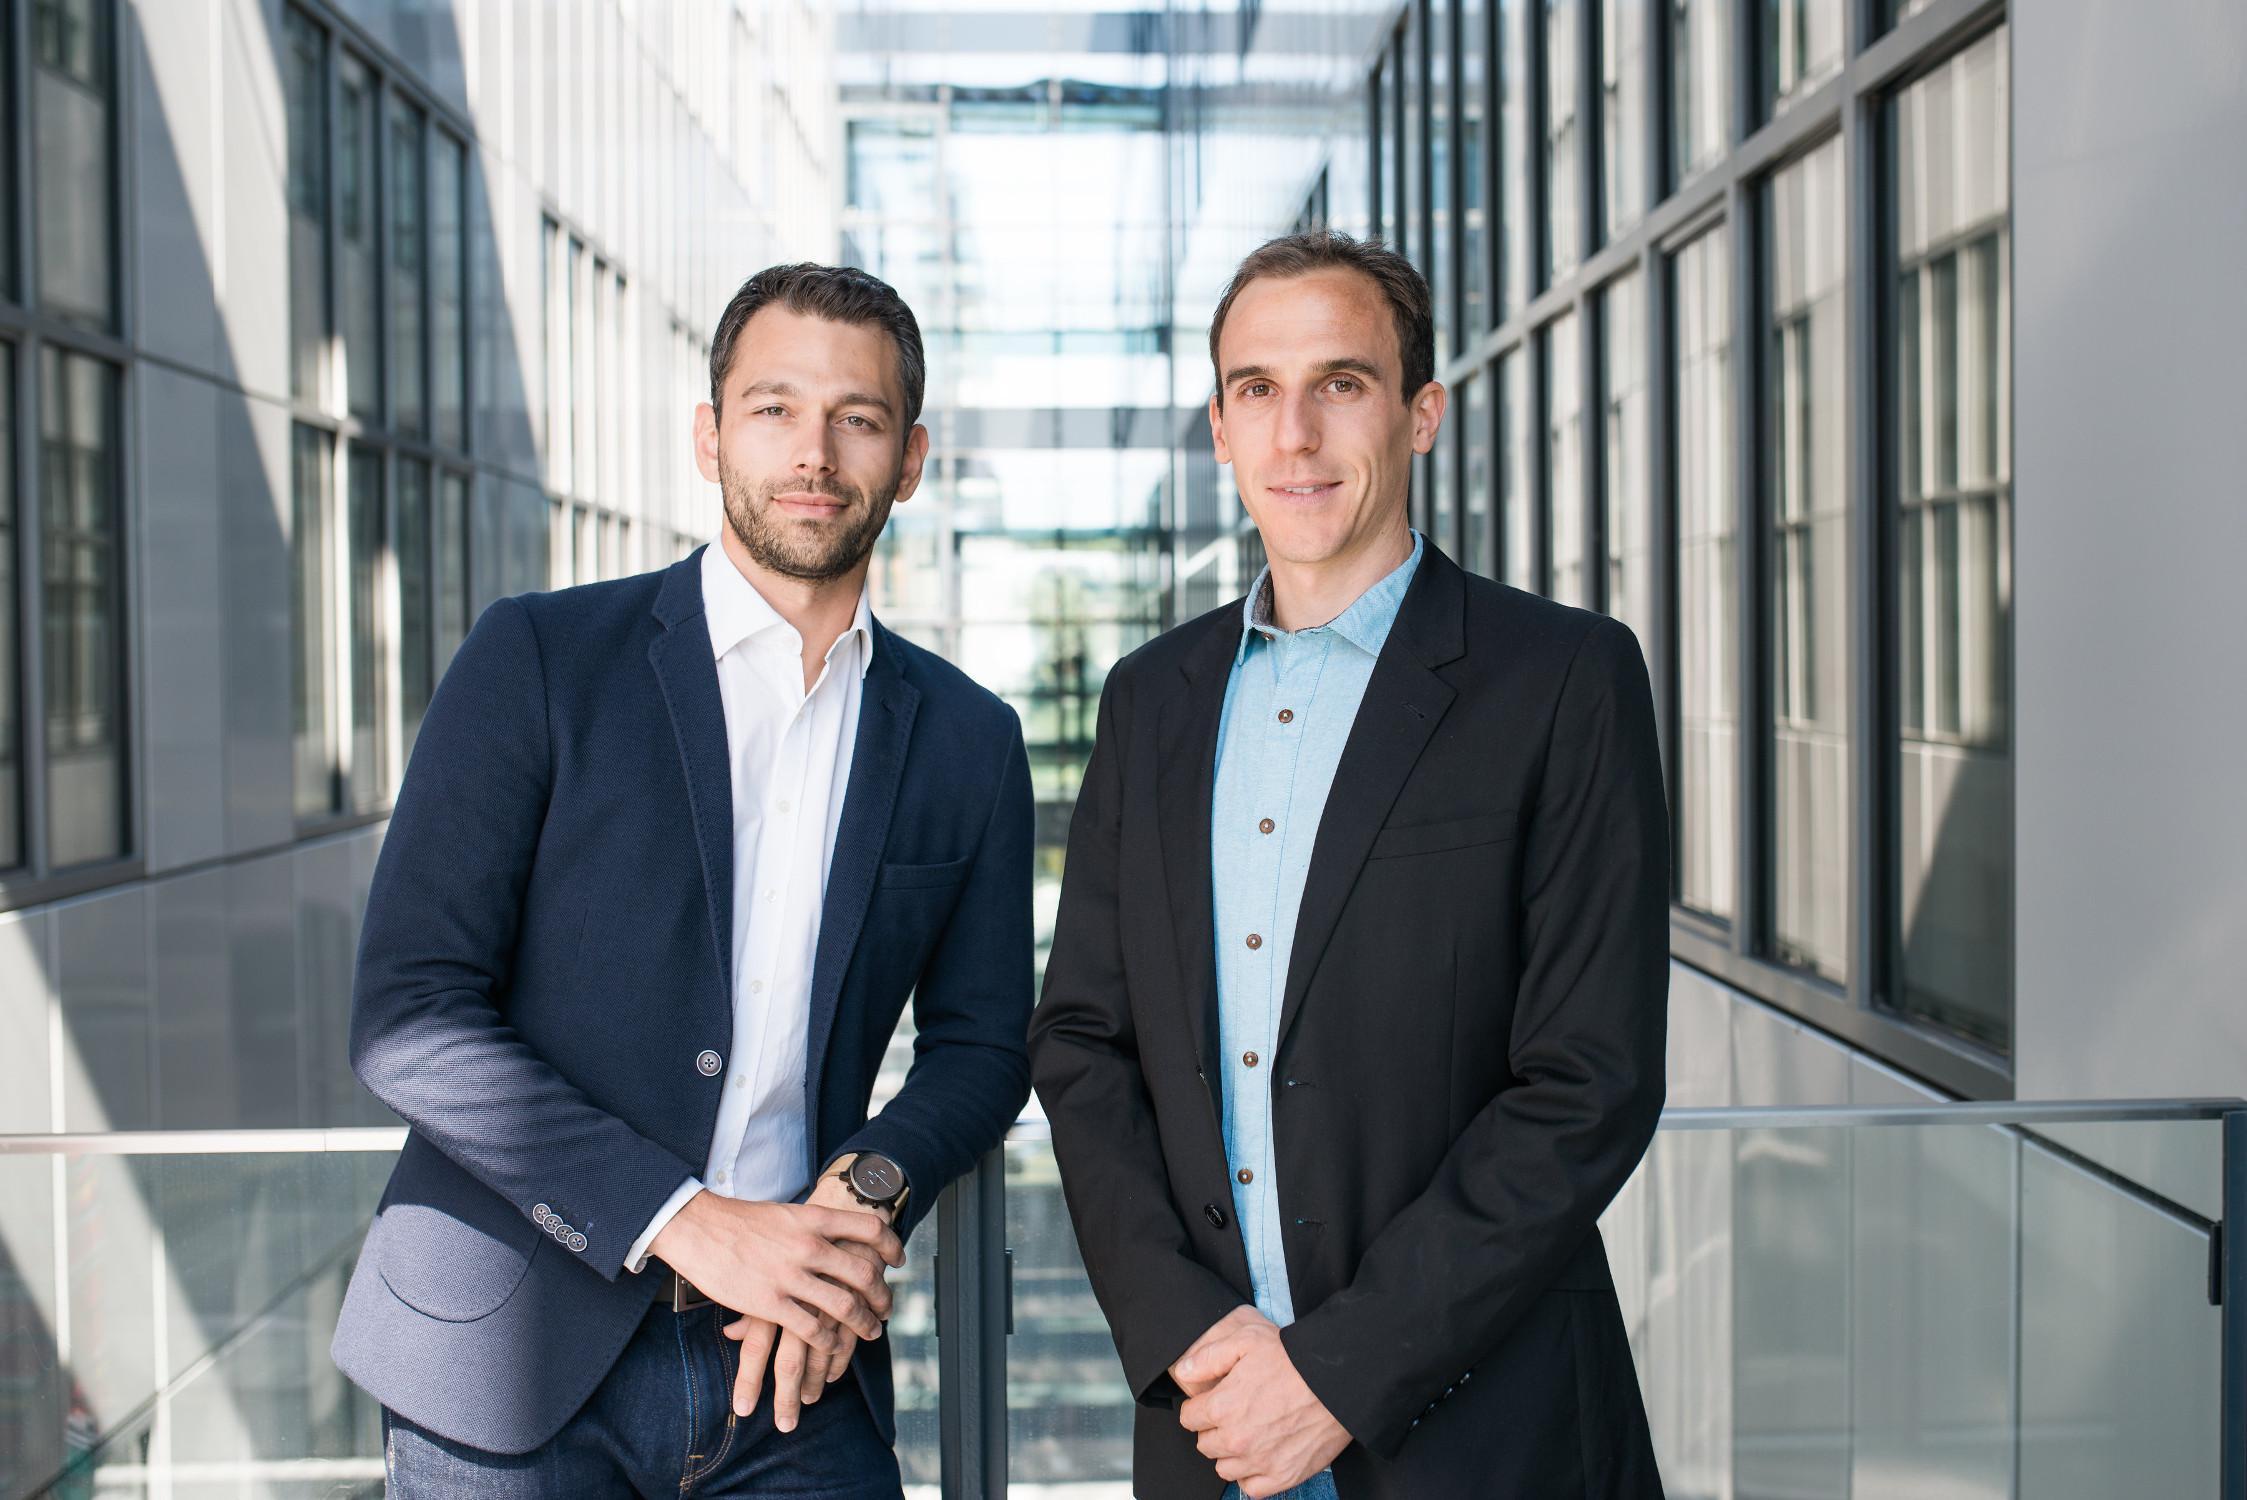 01-kmlvision-founders-1-c-GKartworks